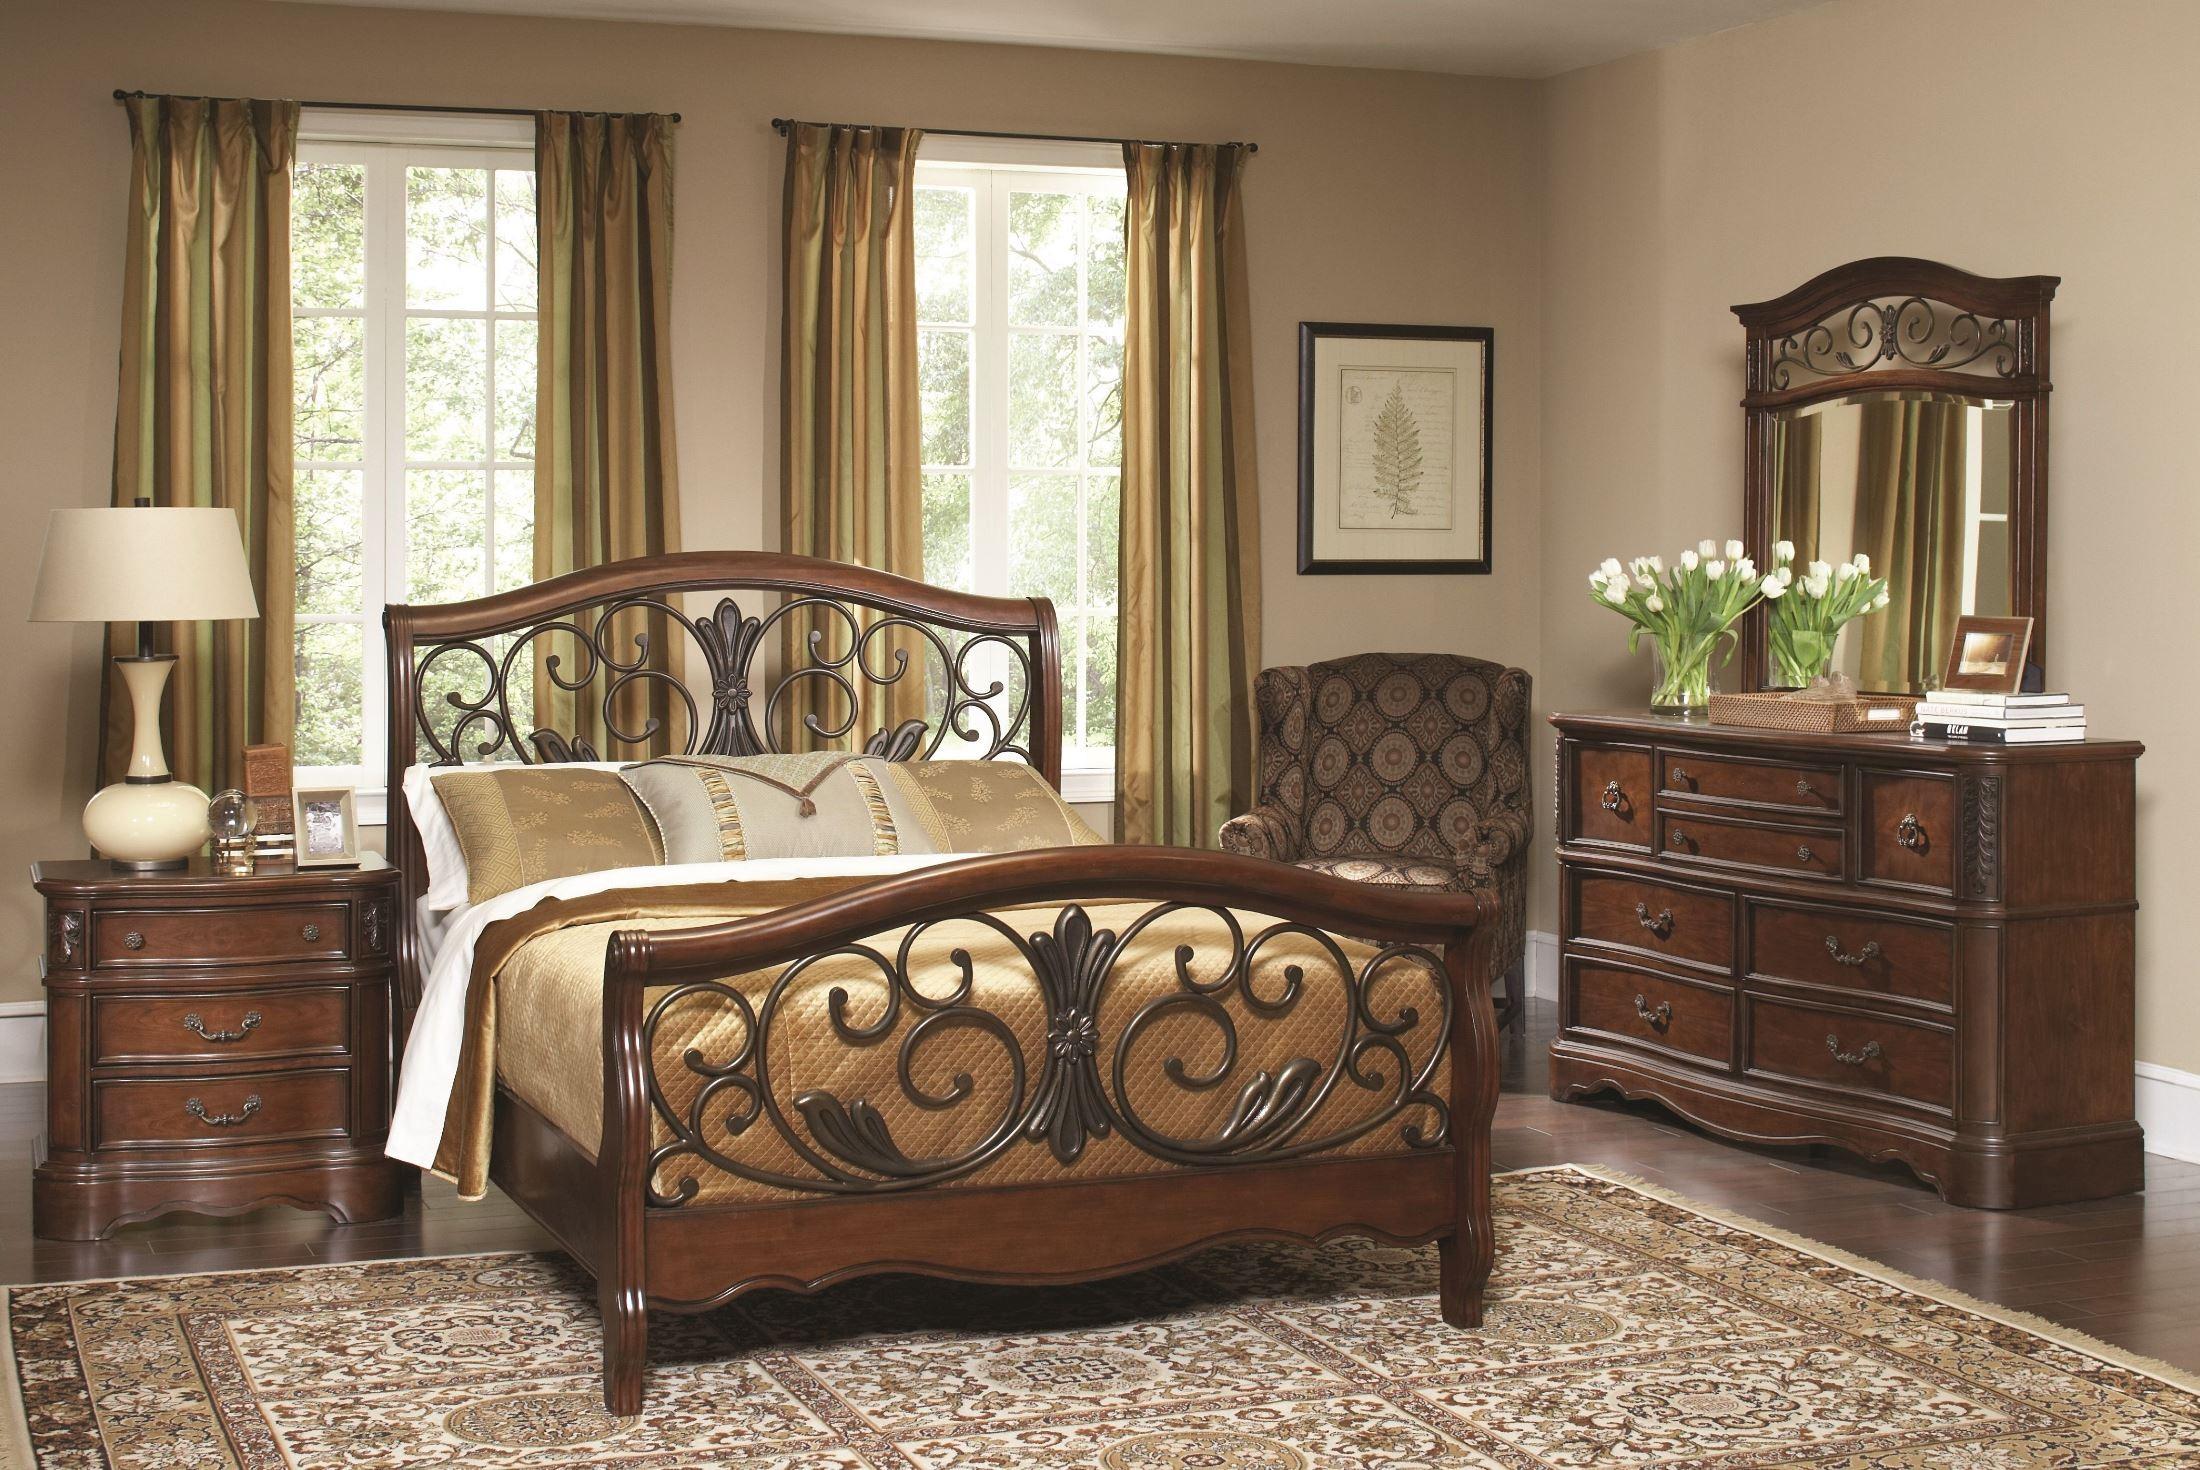 Belle Meade Courtyard Cherry Panel Bedroom Set B1095 52h 52f 5262r Largo Furniture